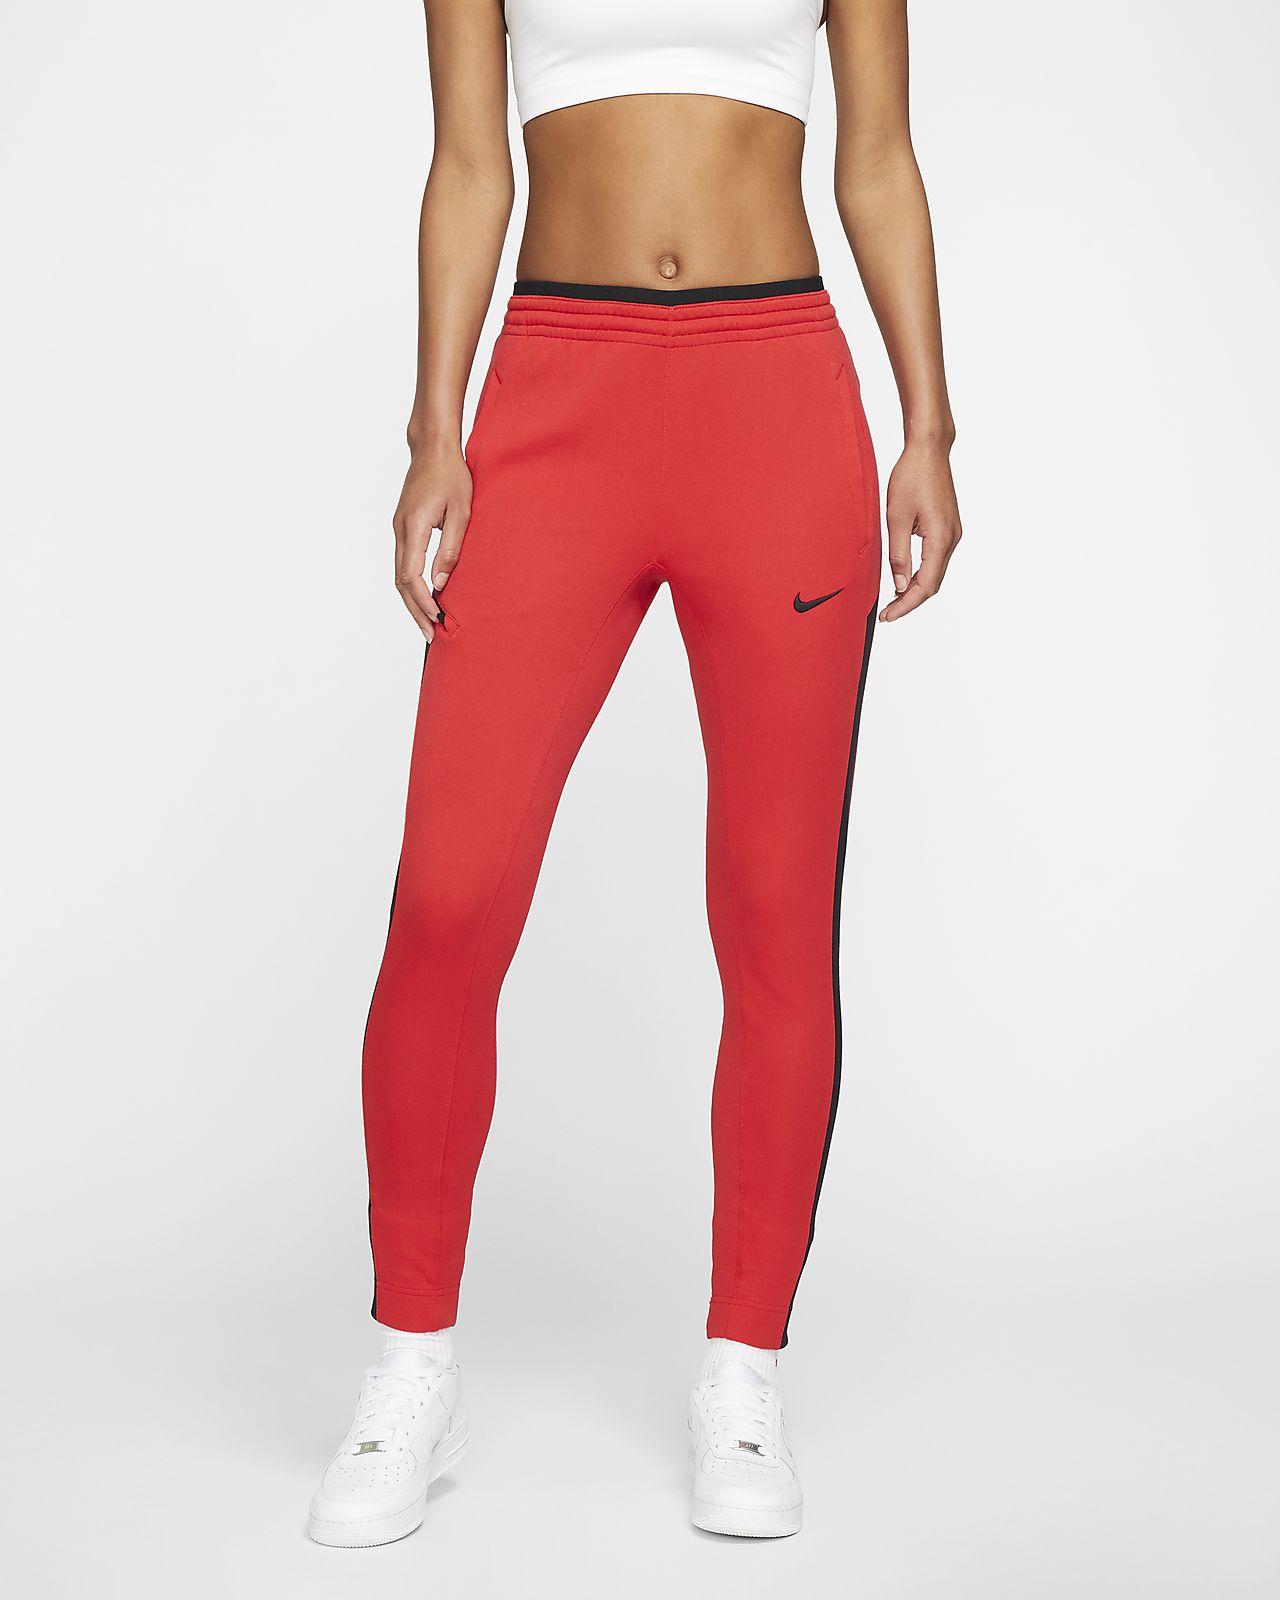 Nike Dri-FIT Showtime Women's Basketball Pants (Stock)